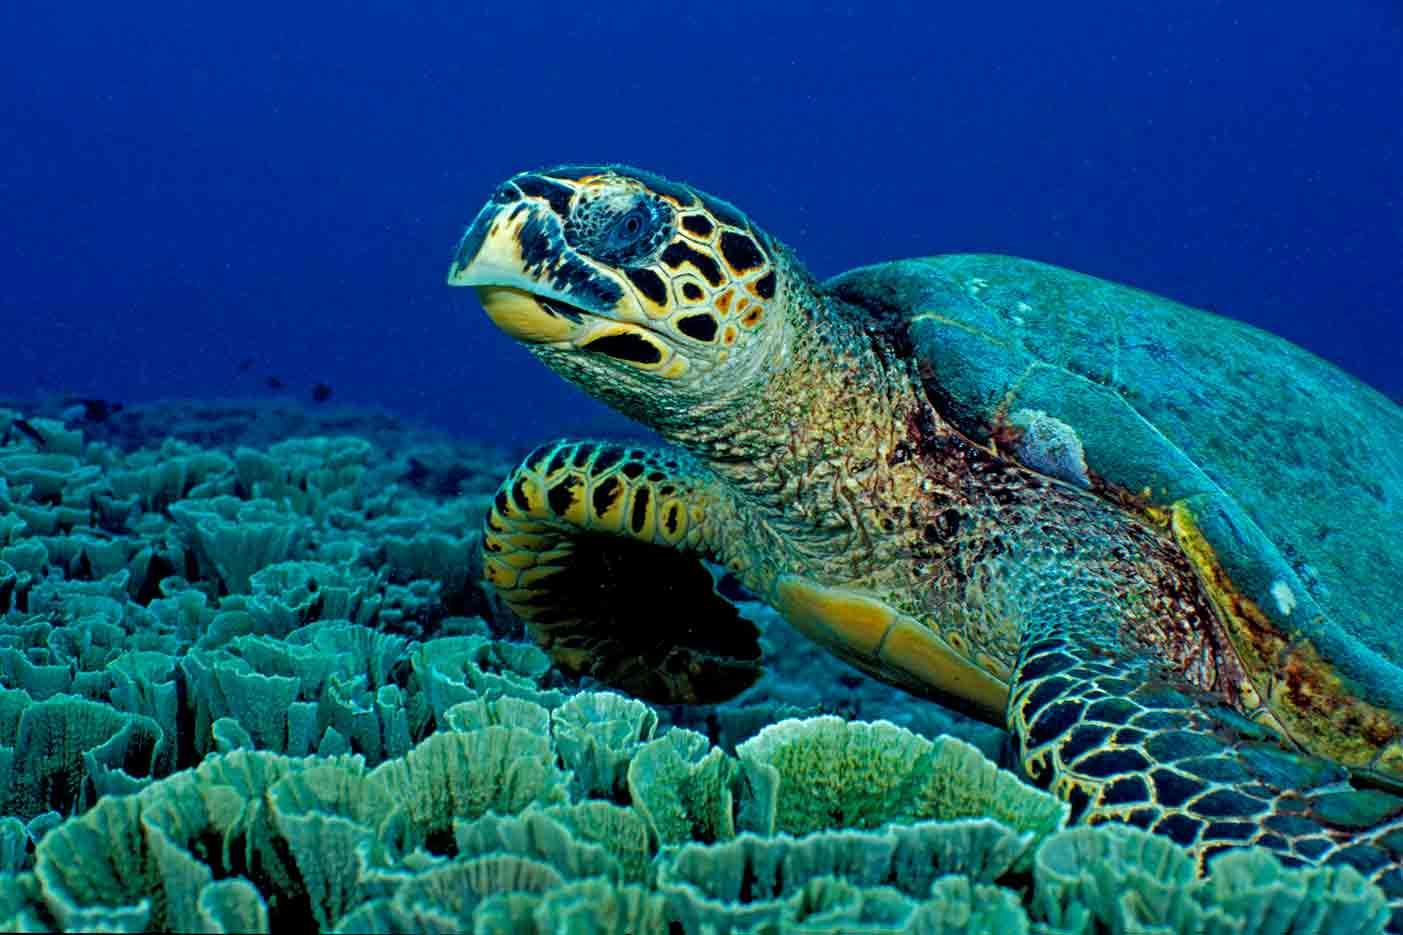 Gili-Trawangan-Lombok-Activities-Activity-Scuba-Scubadive-Scubadiving-Dive-Diving-37.jpg